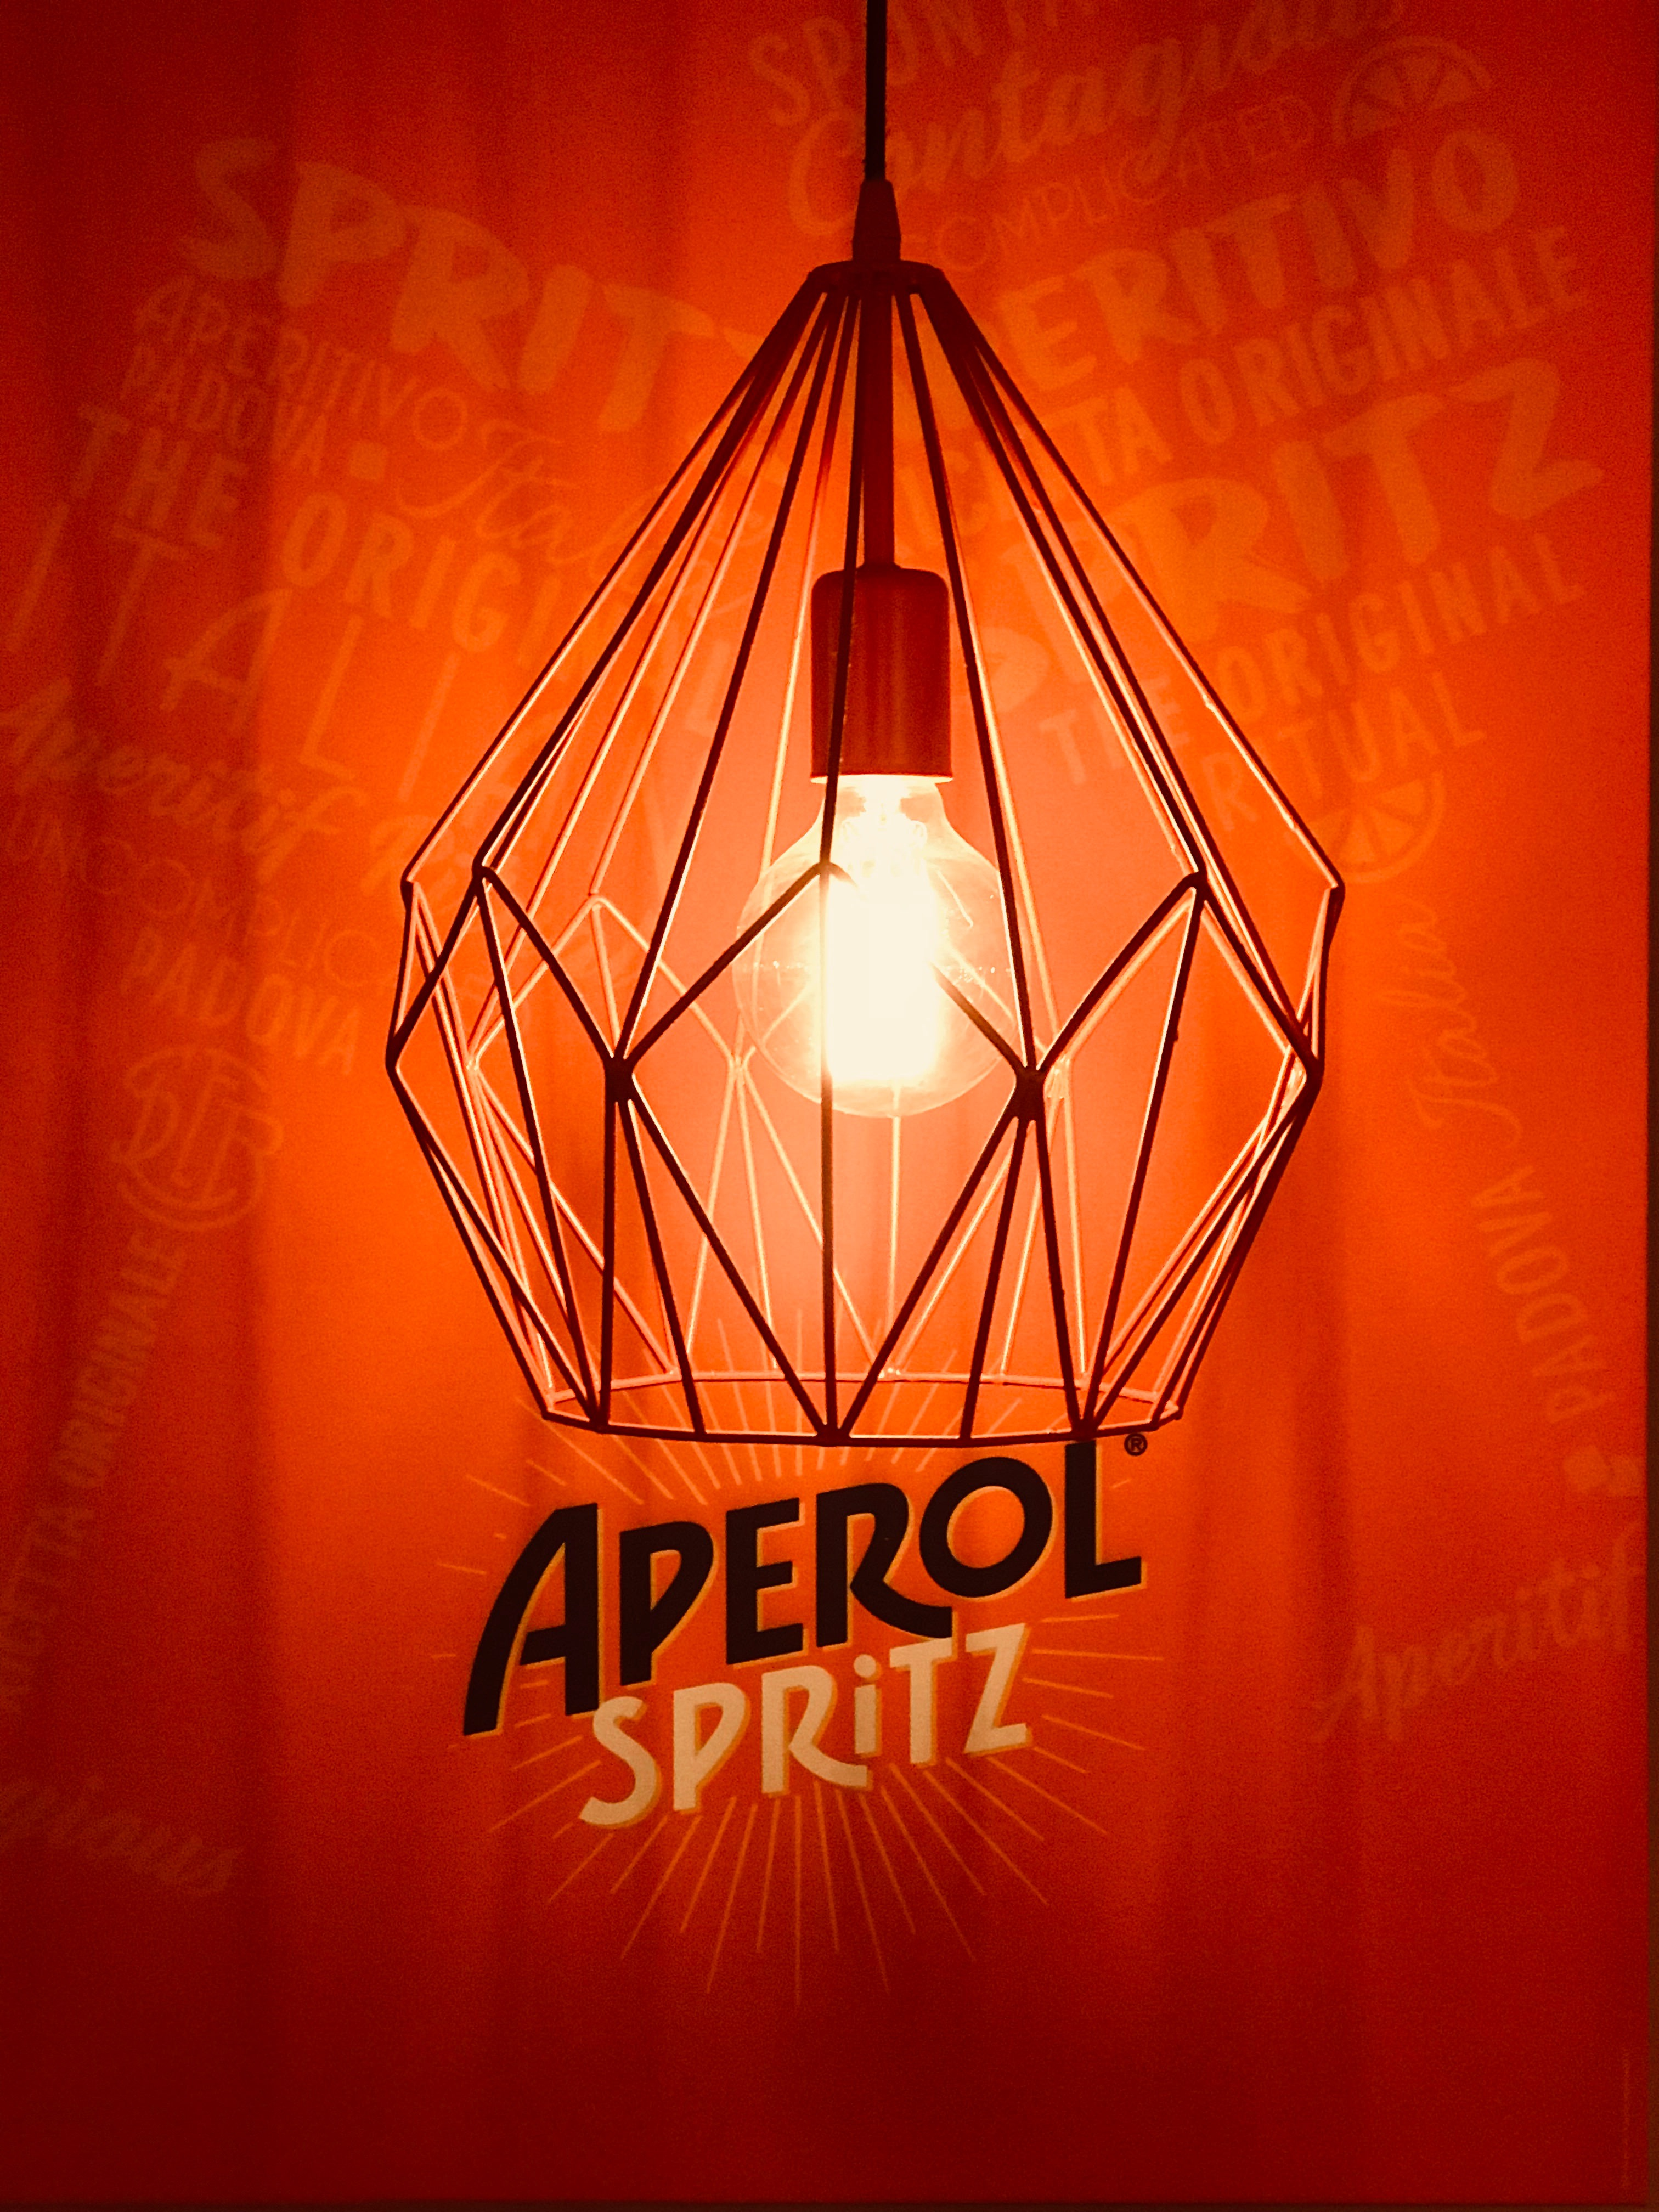 Aperol-Spritz-Bar-Barcelona